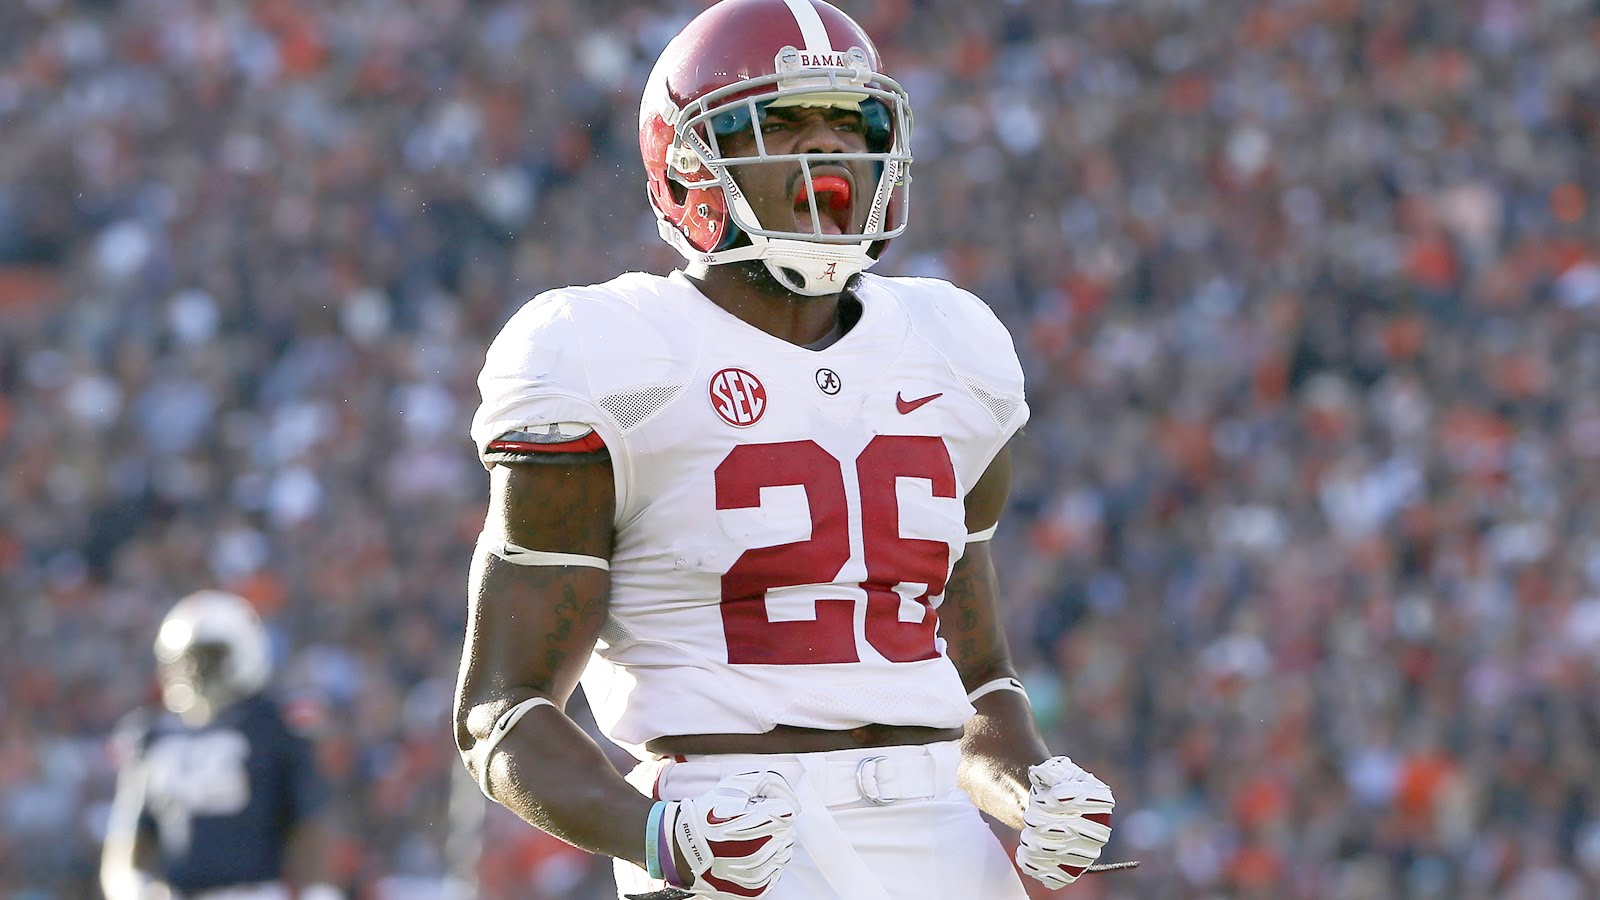 Fanatics View Draft Profile: Landon Collins (S - Alabama)